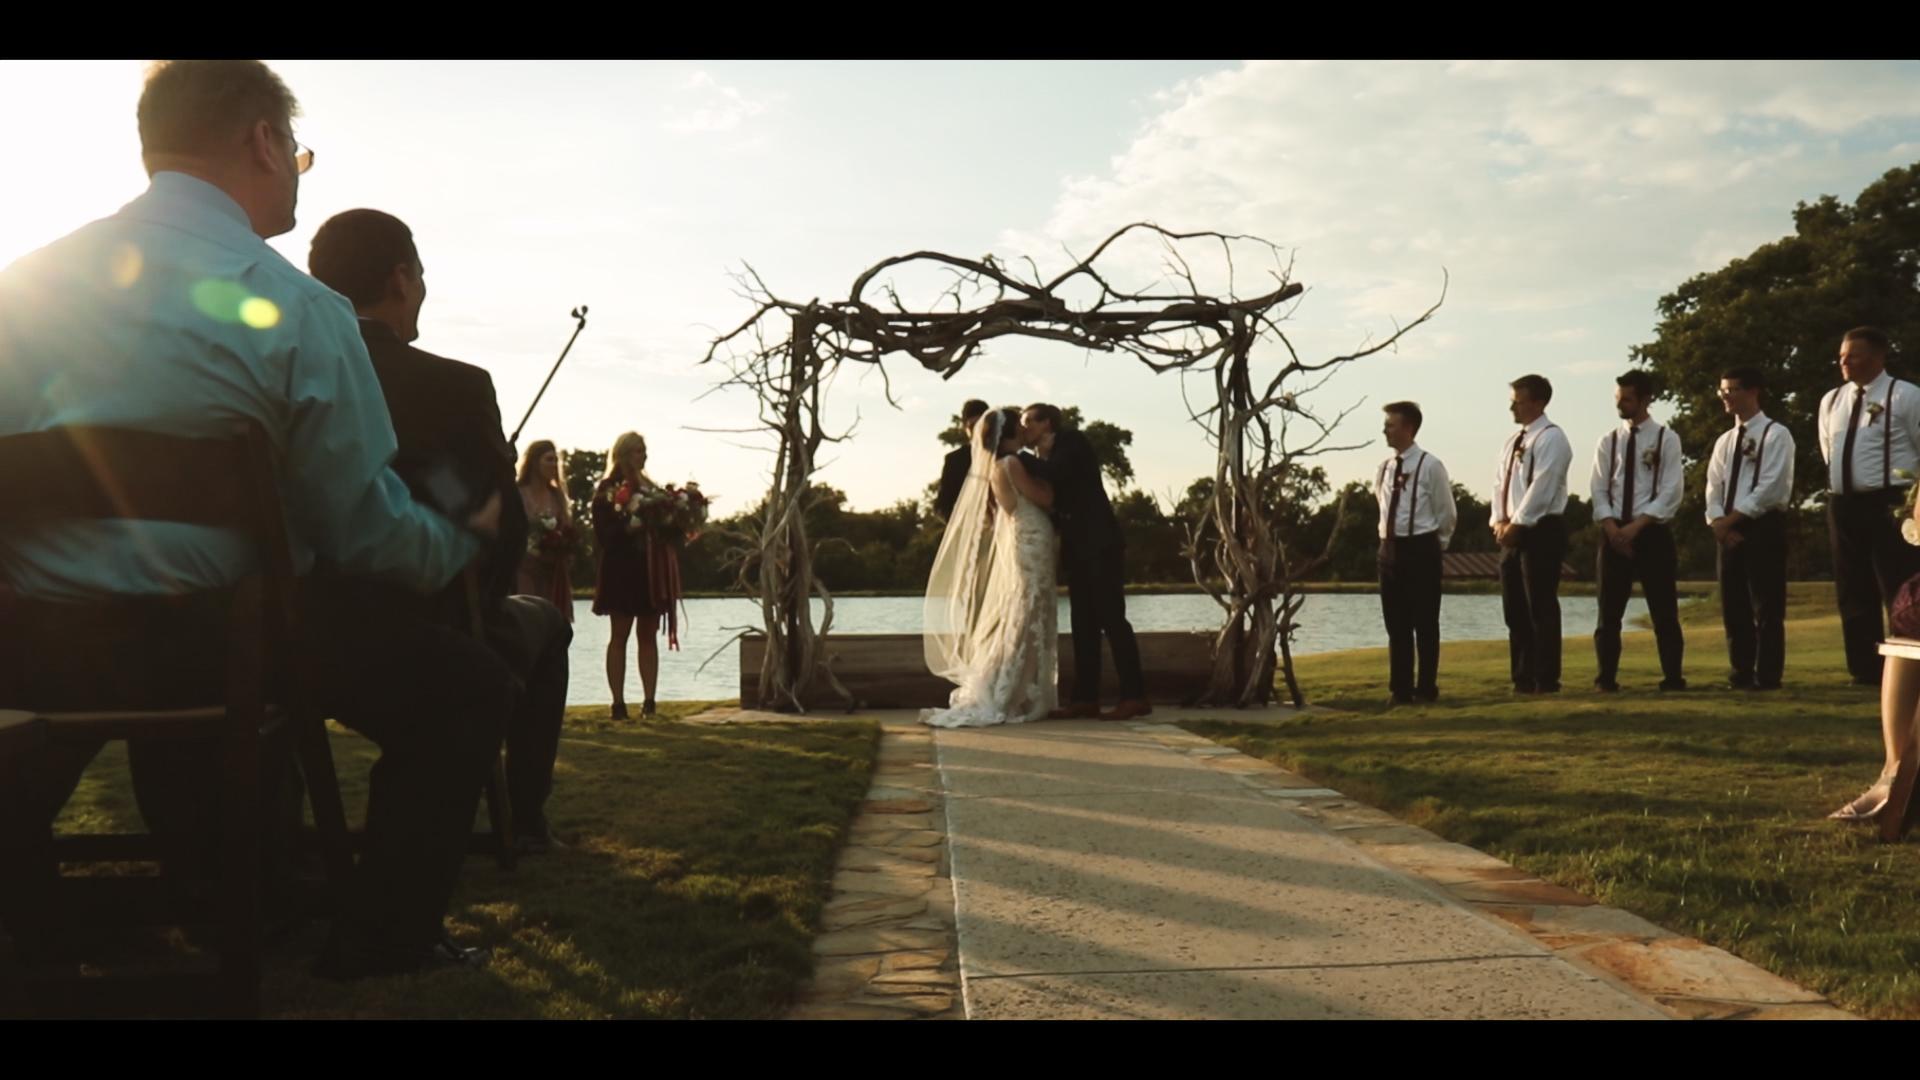 Connor + Ben's Rustic Fall Wedding /// Thistle Springs Ranch Wedding Film